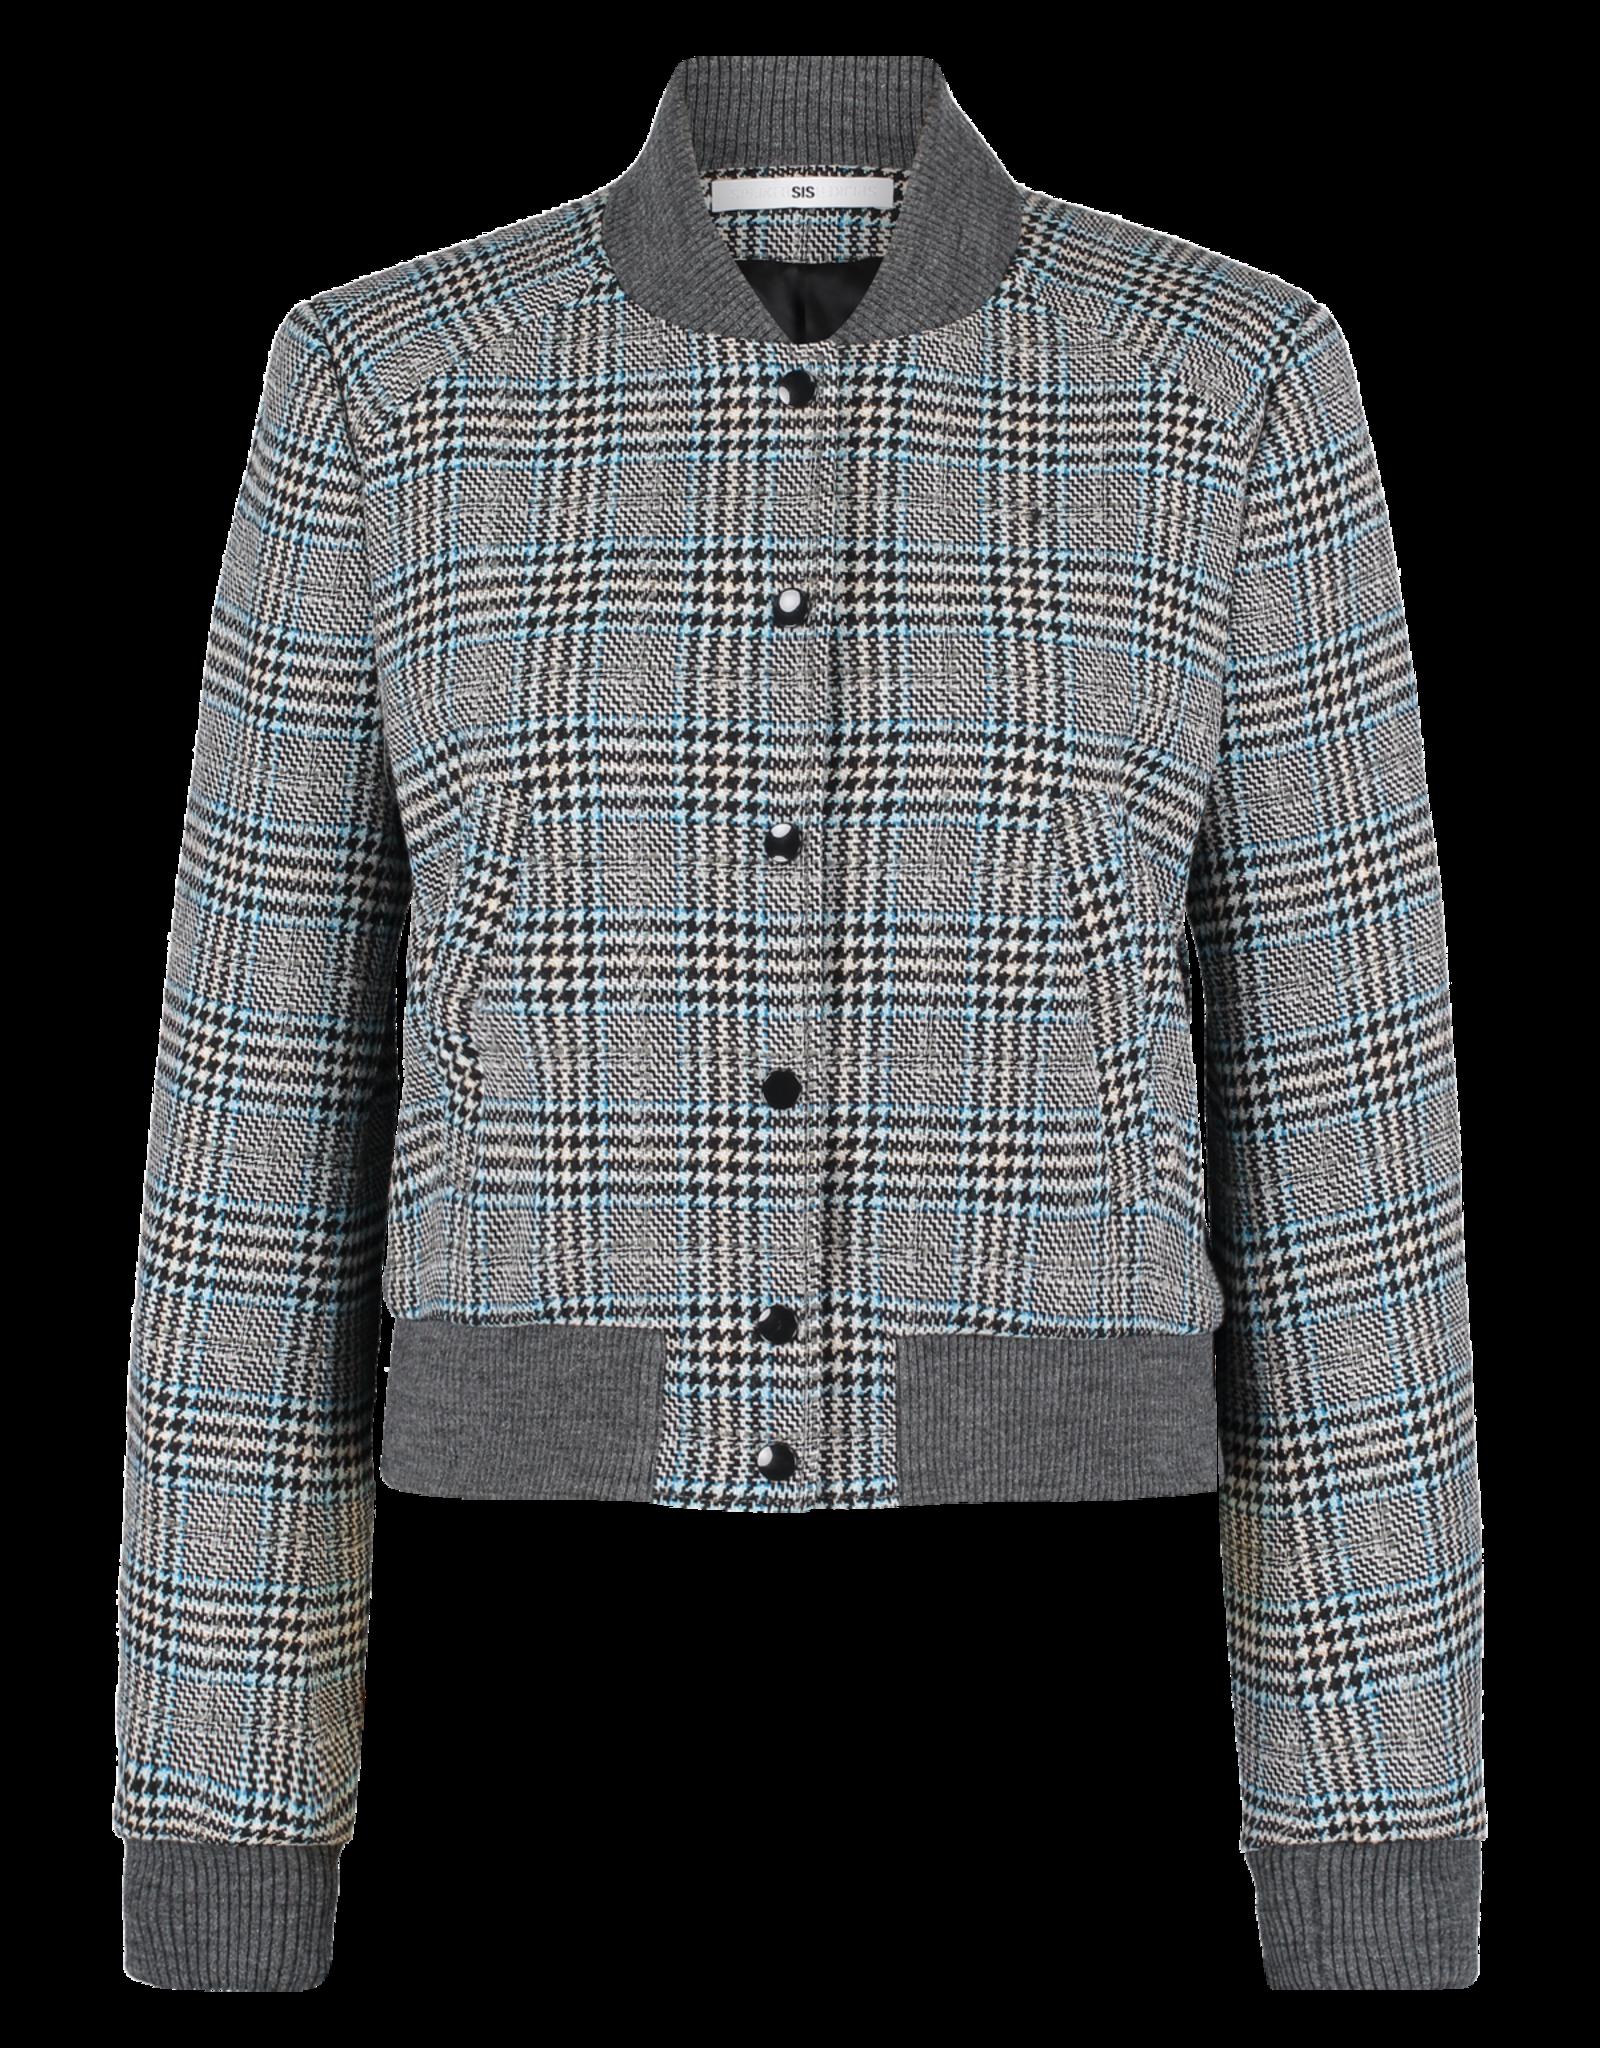 AW1920 405-J College Jacket